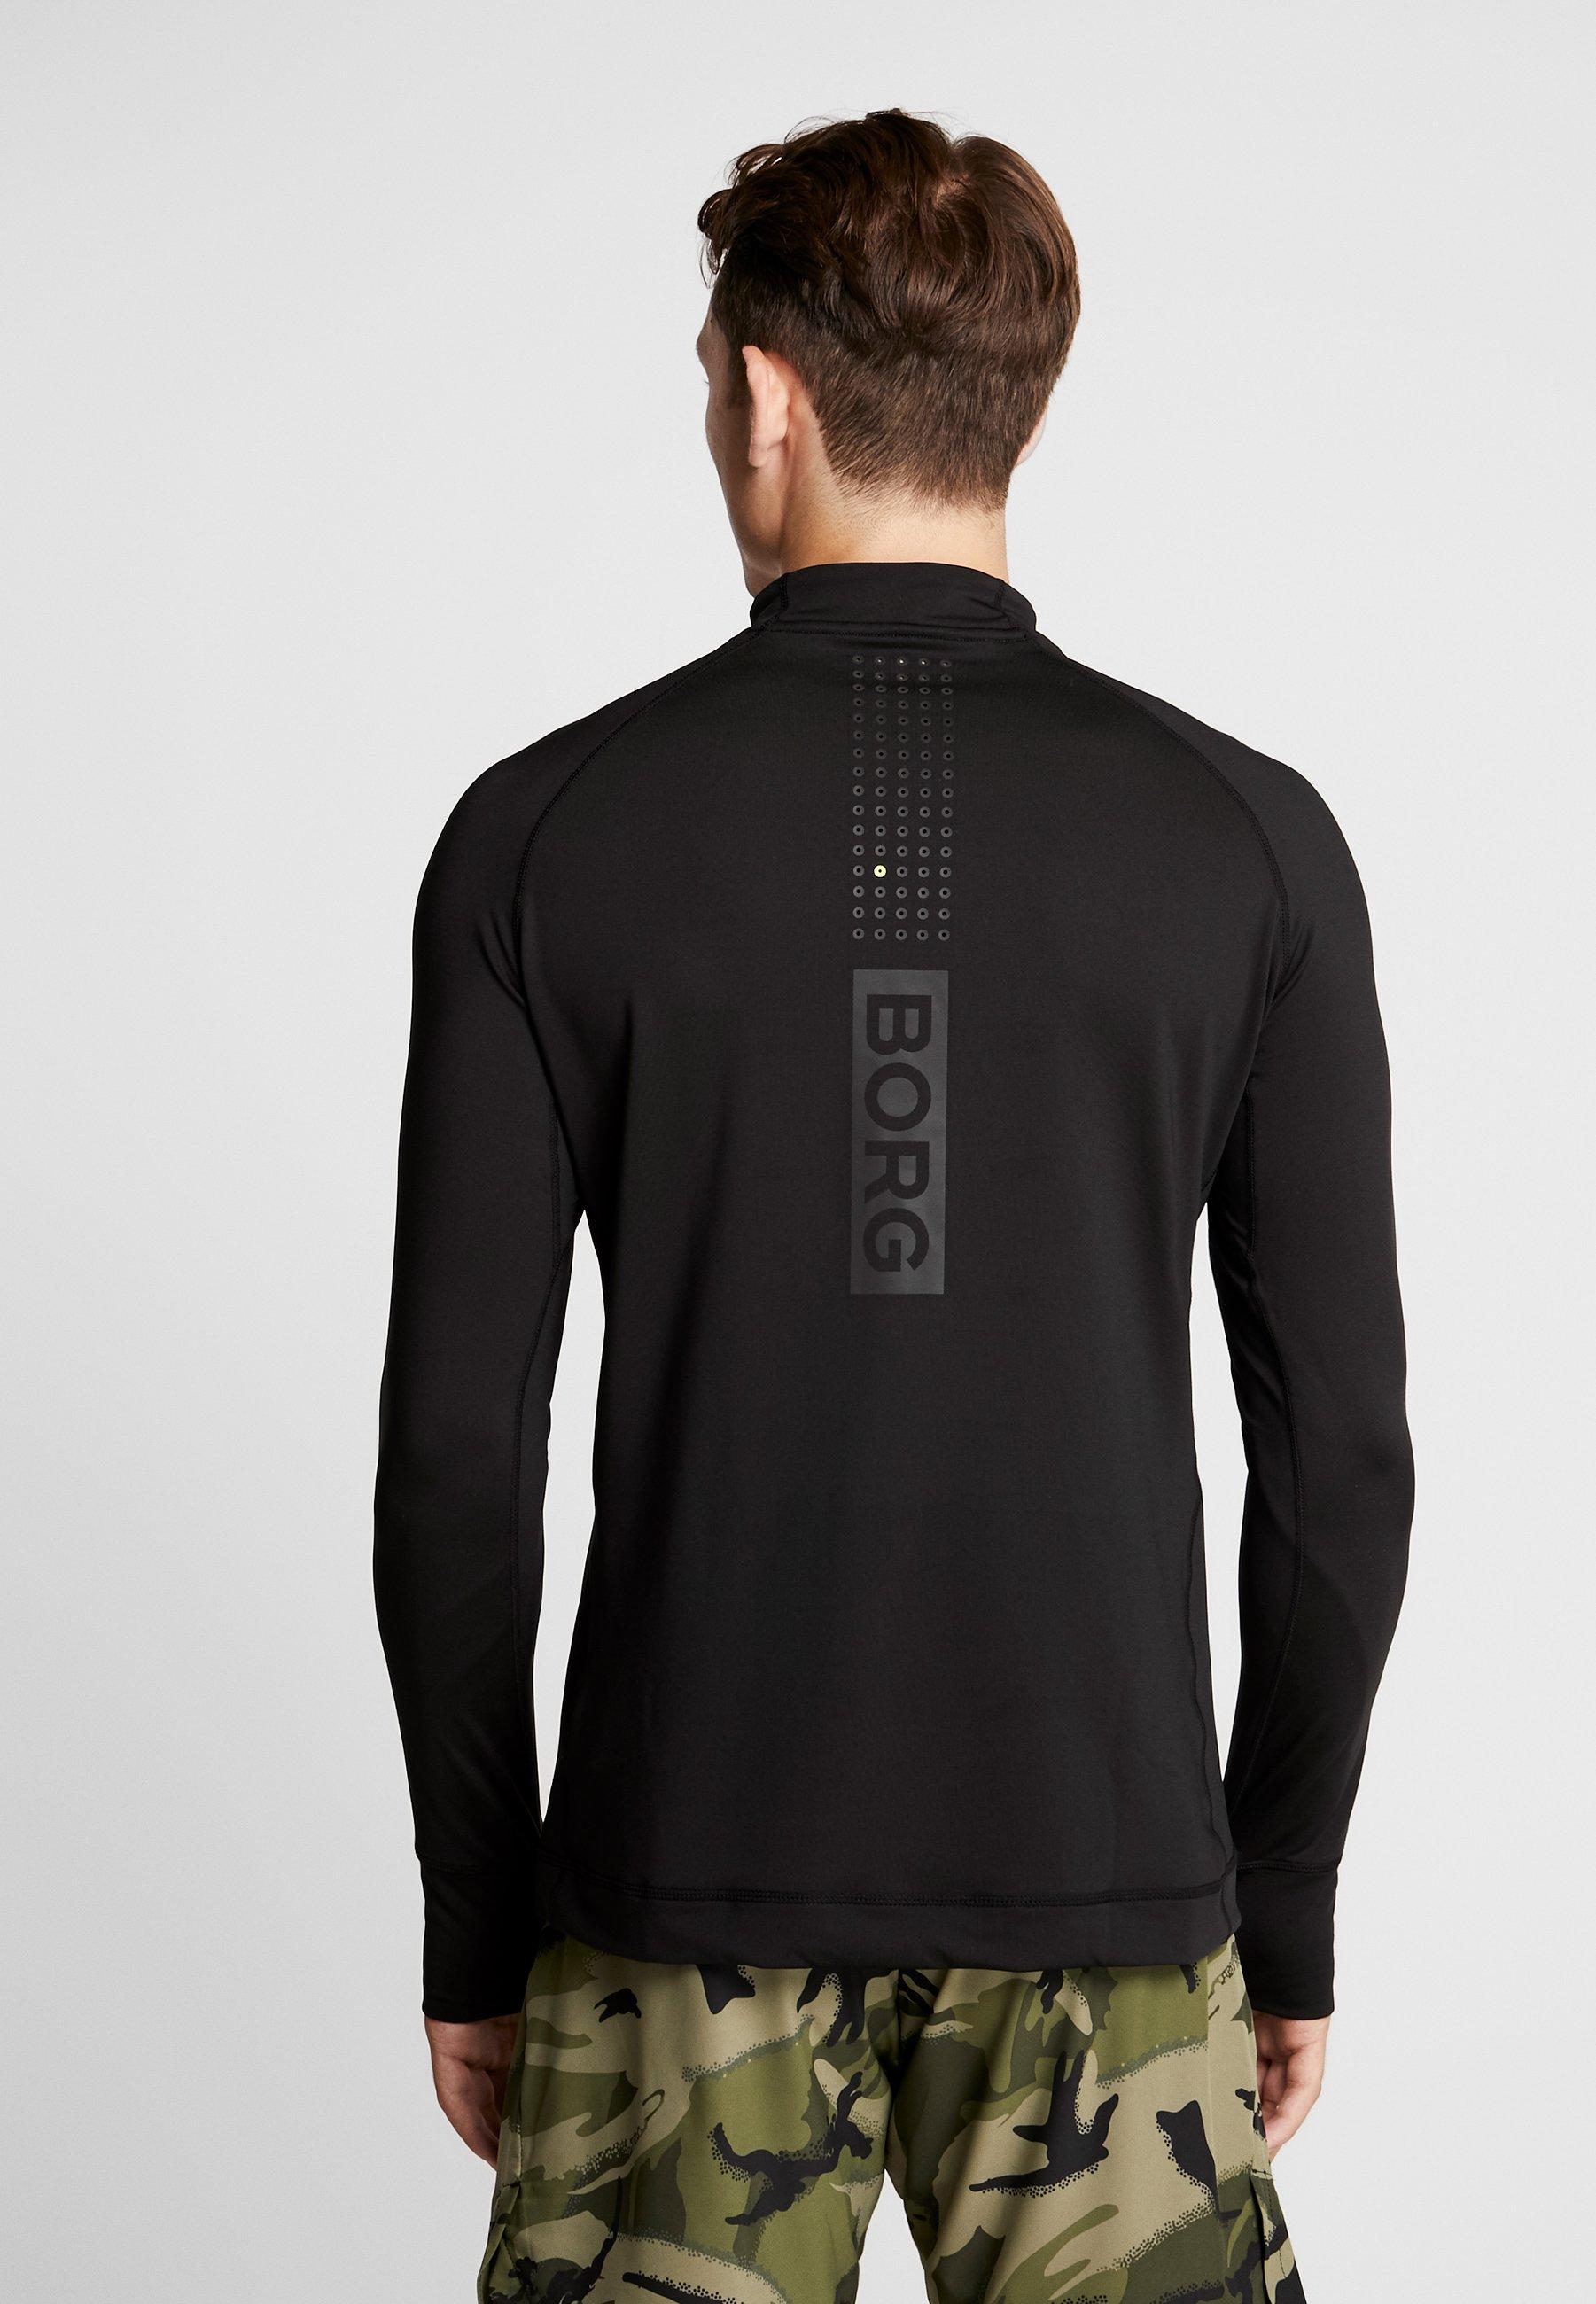 Black Neck AndersT Björn Sport De Borg Mock shirt Beauty srdChQxBt